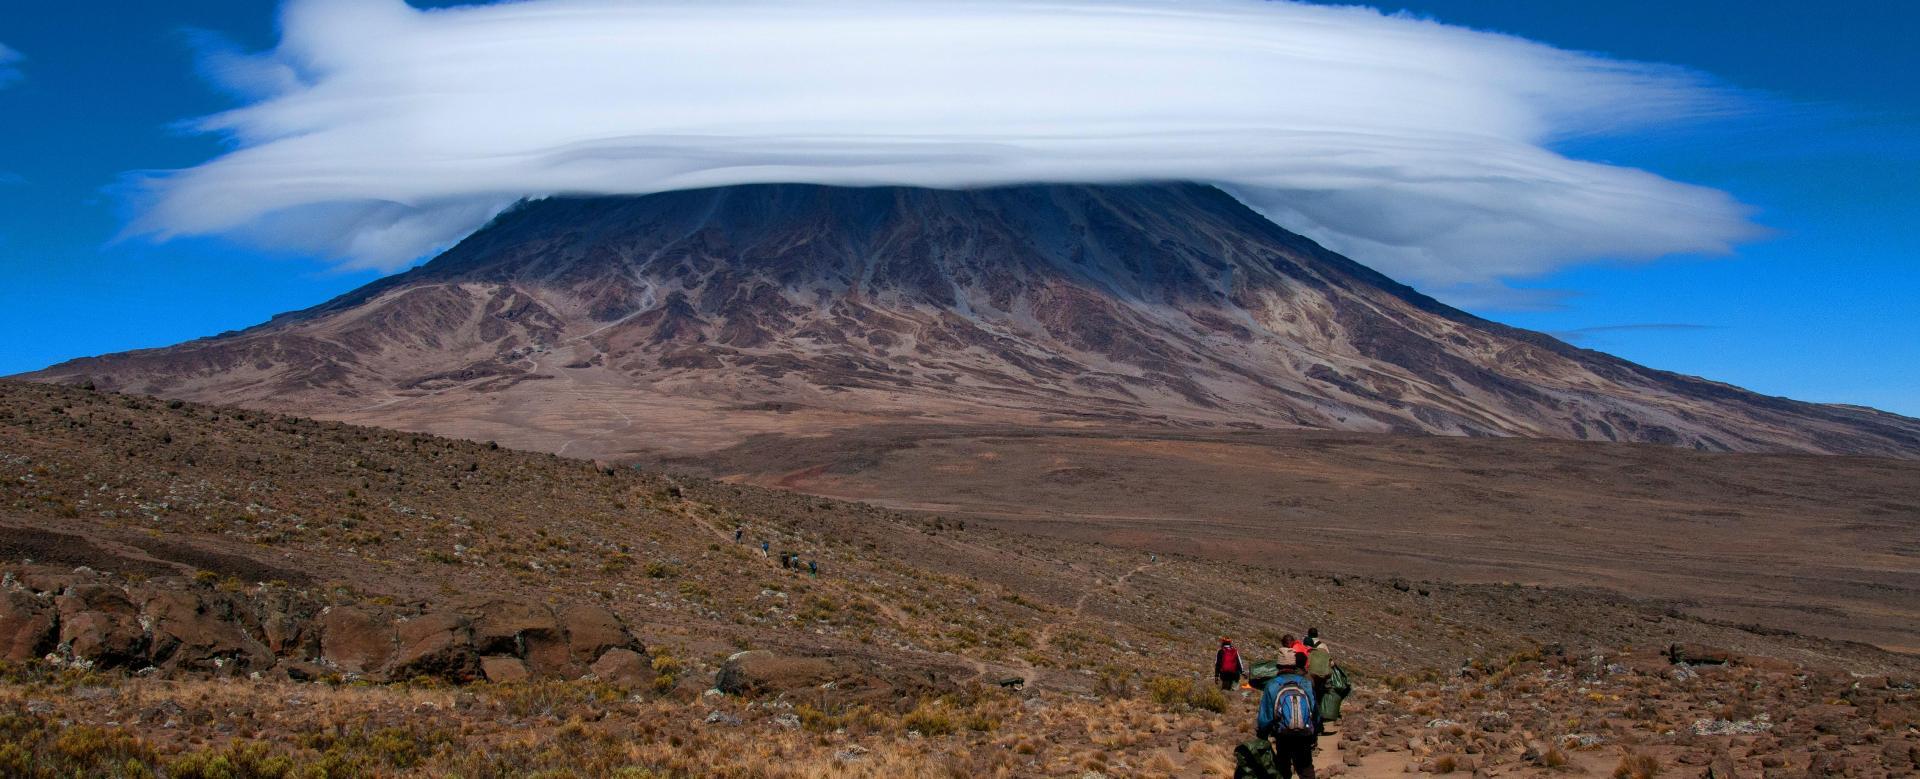 Voyage à pied Tanzanie : Mont kenya et kilimandjaro